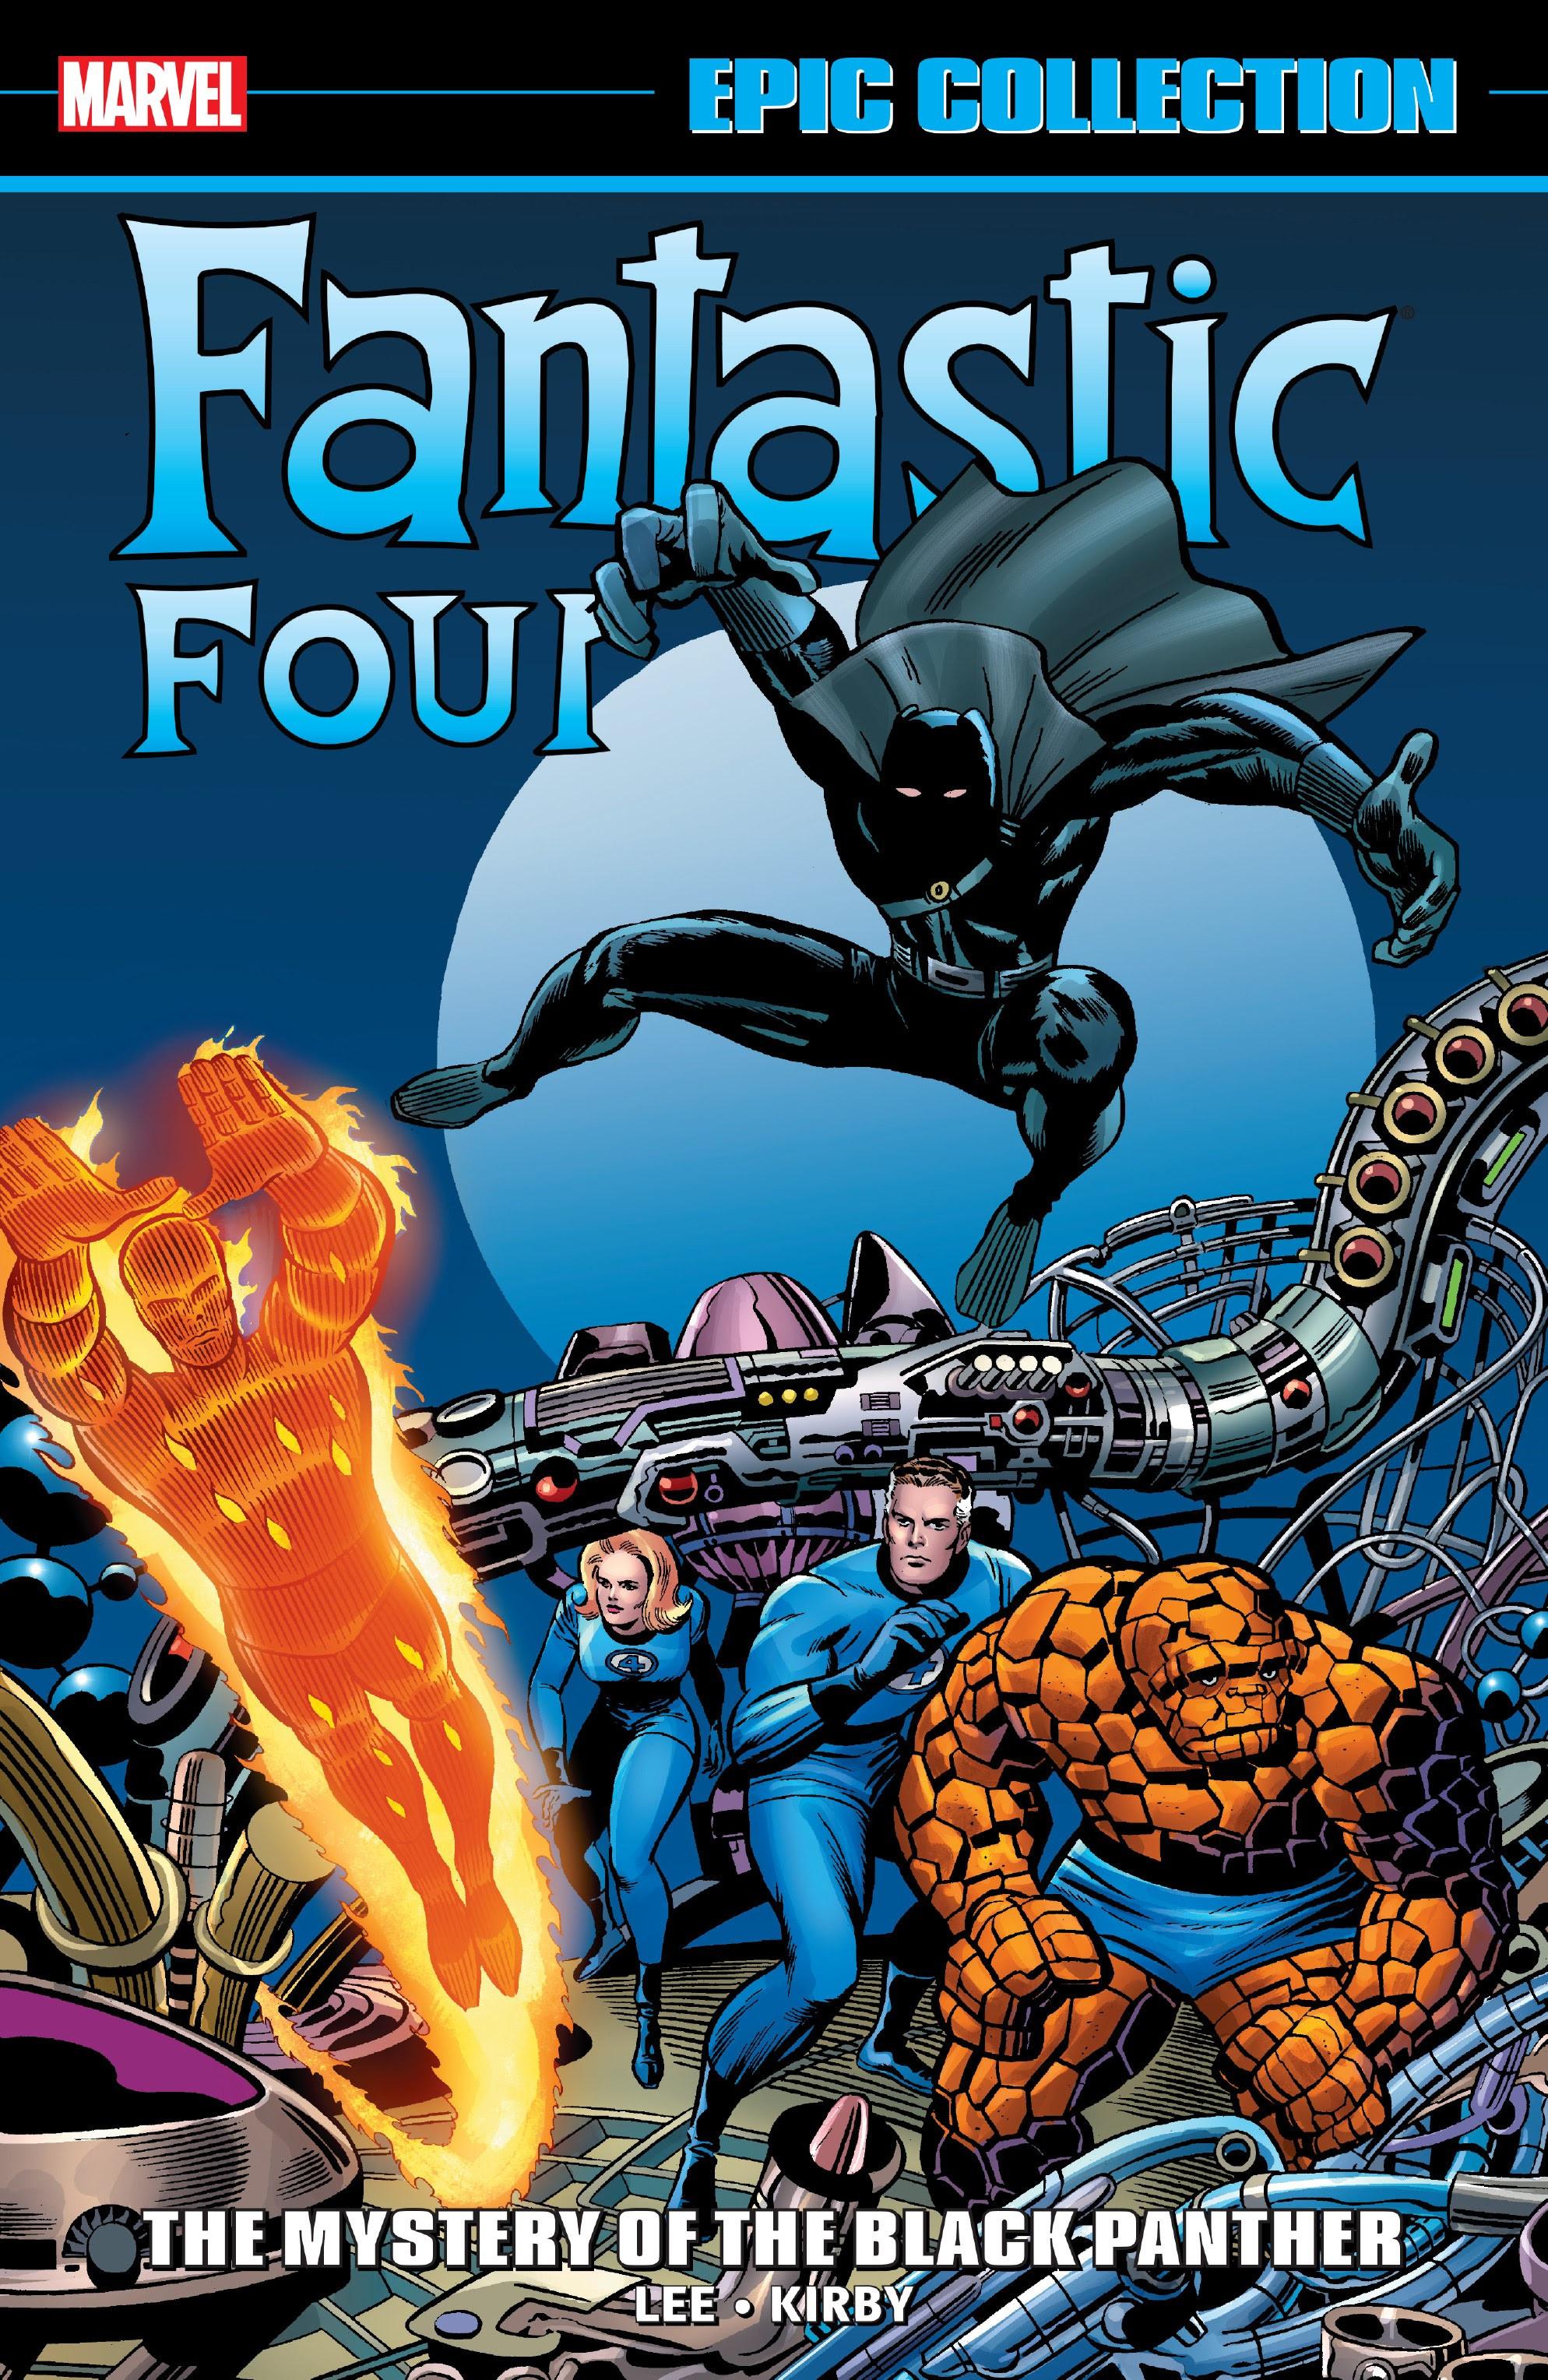 Epic Collection: Fantastic Four Vol 1 4